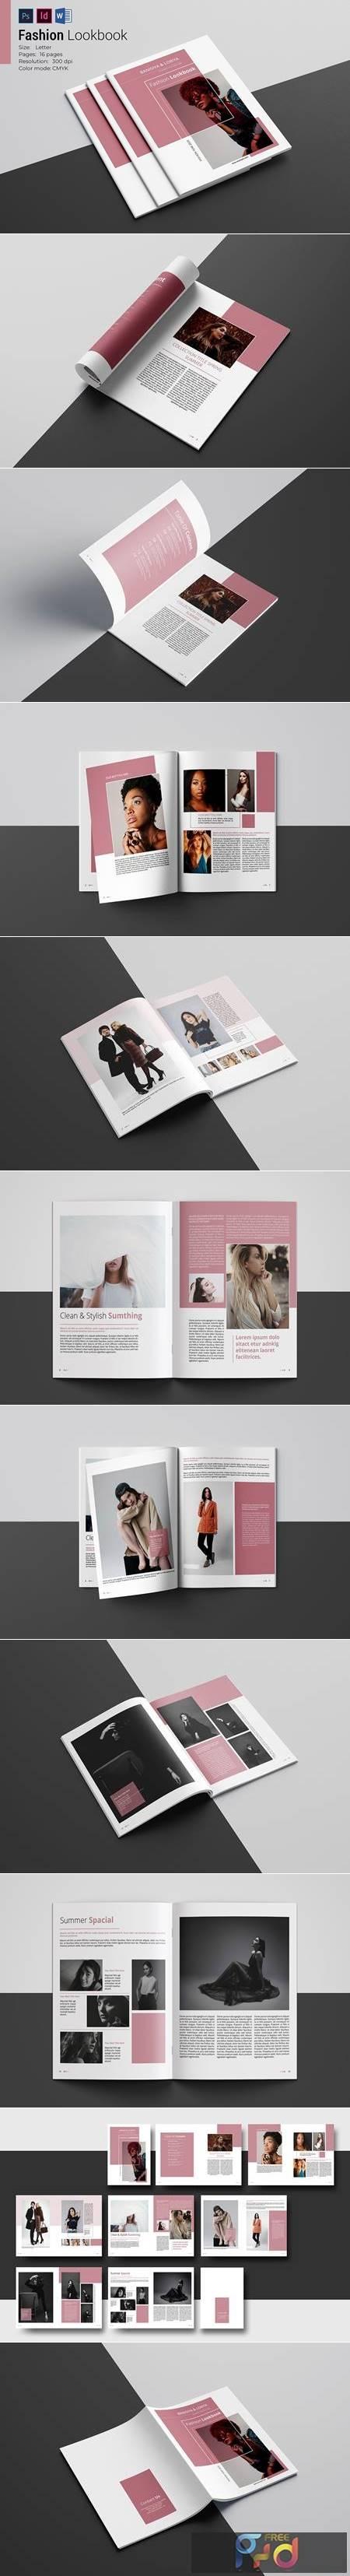 Fashion Lookbook Template 4877779 1